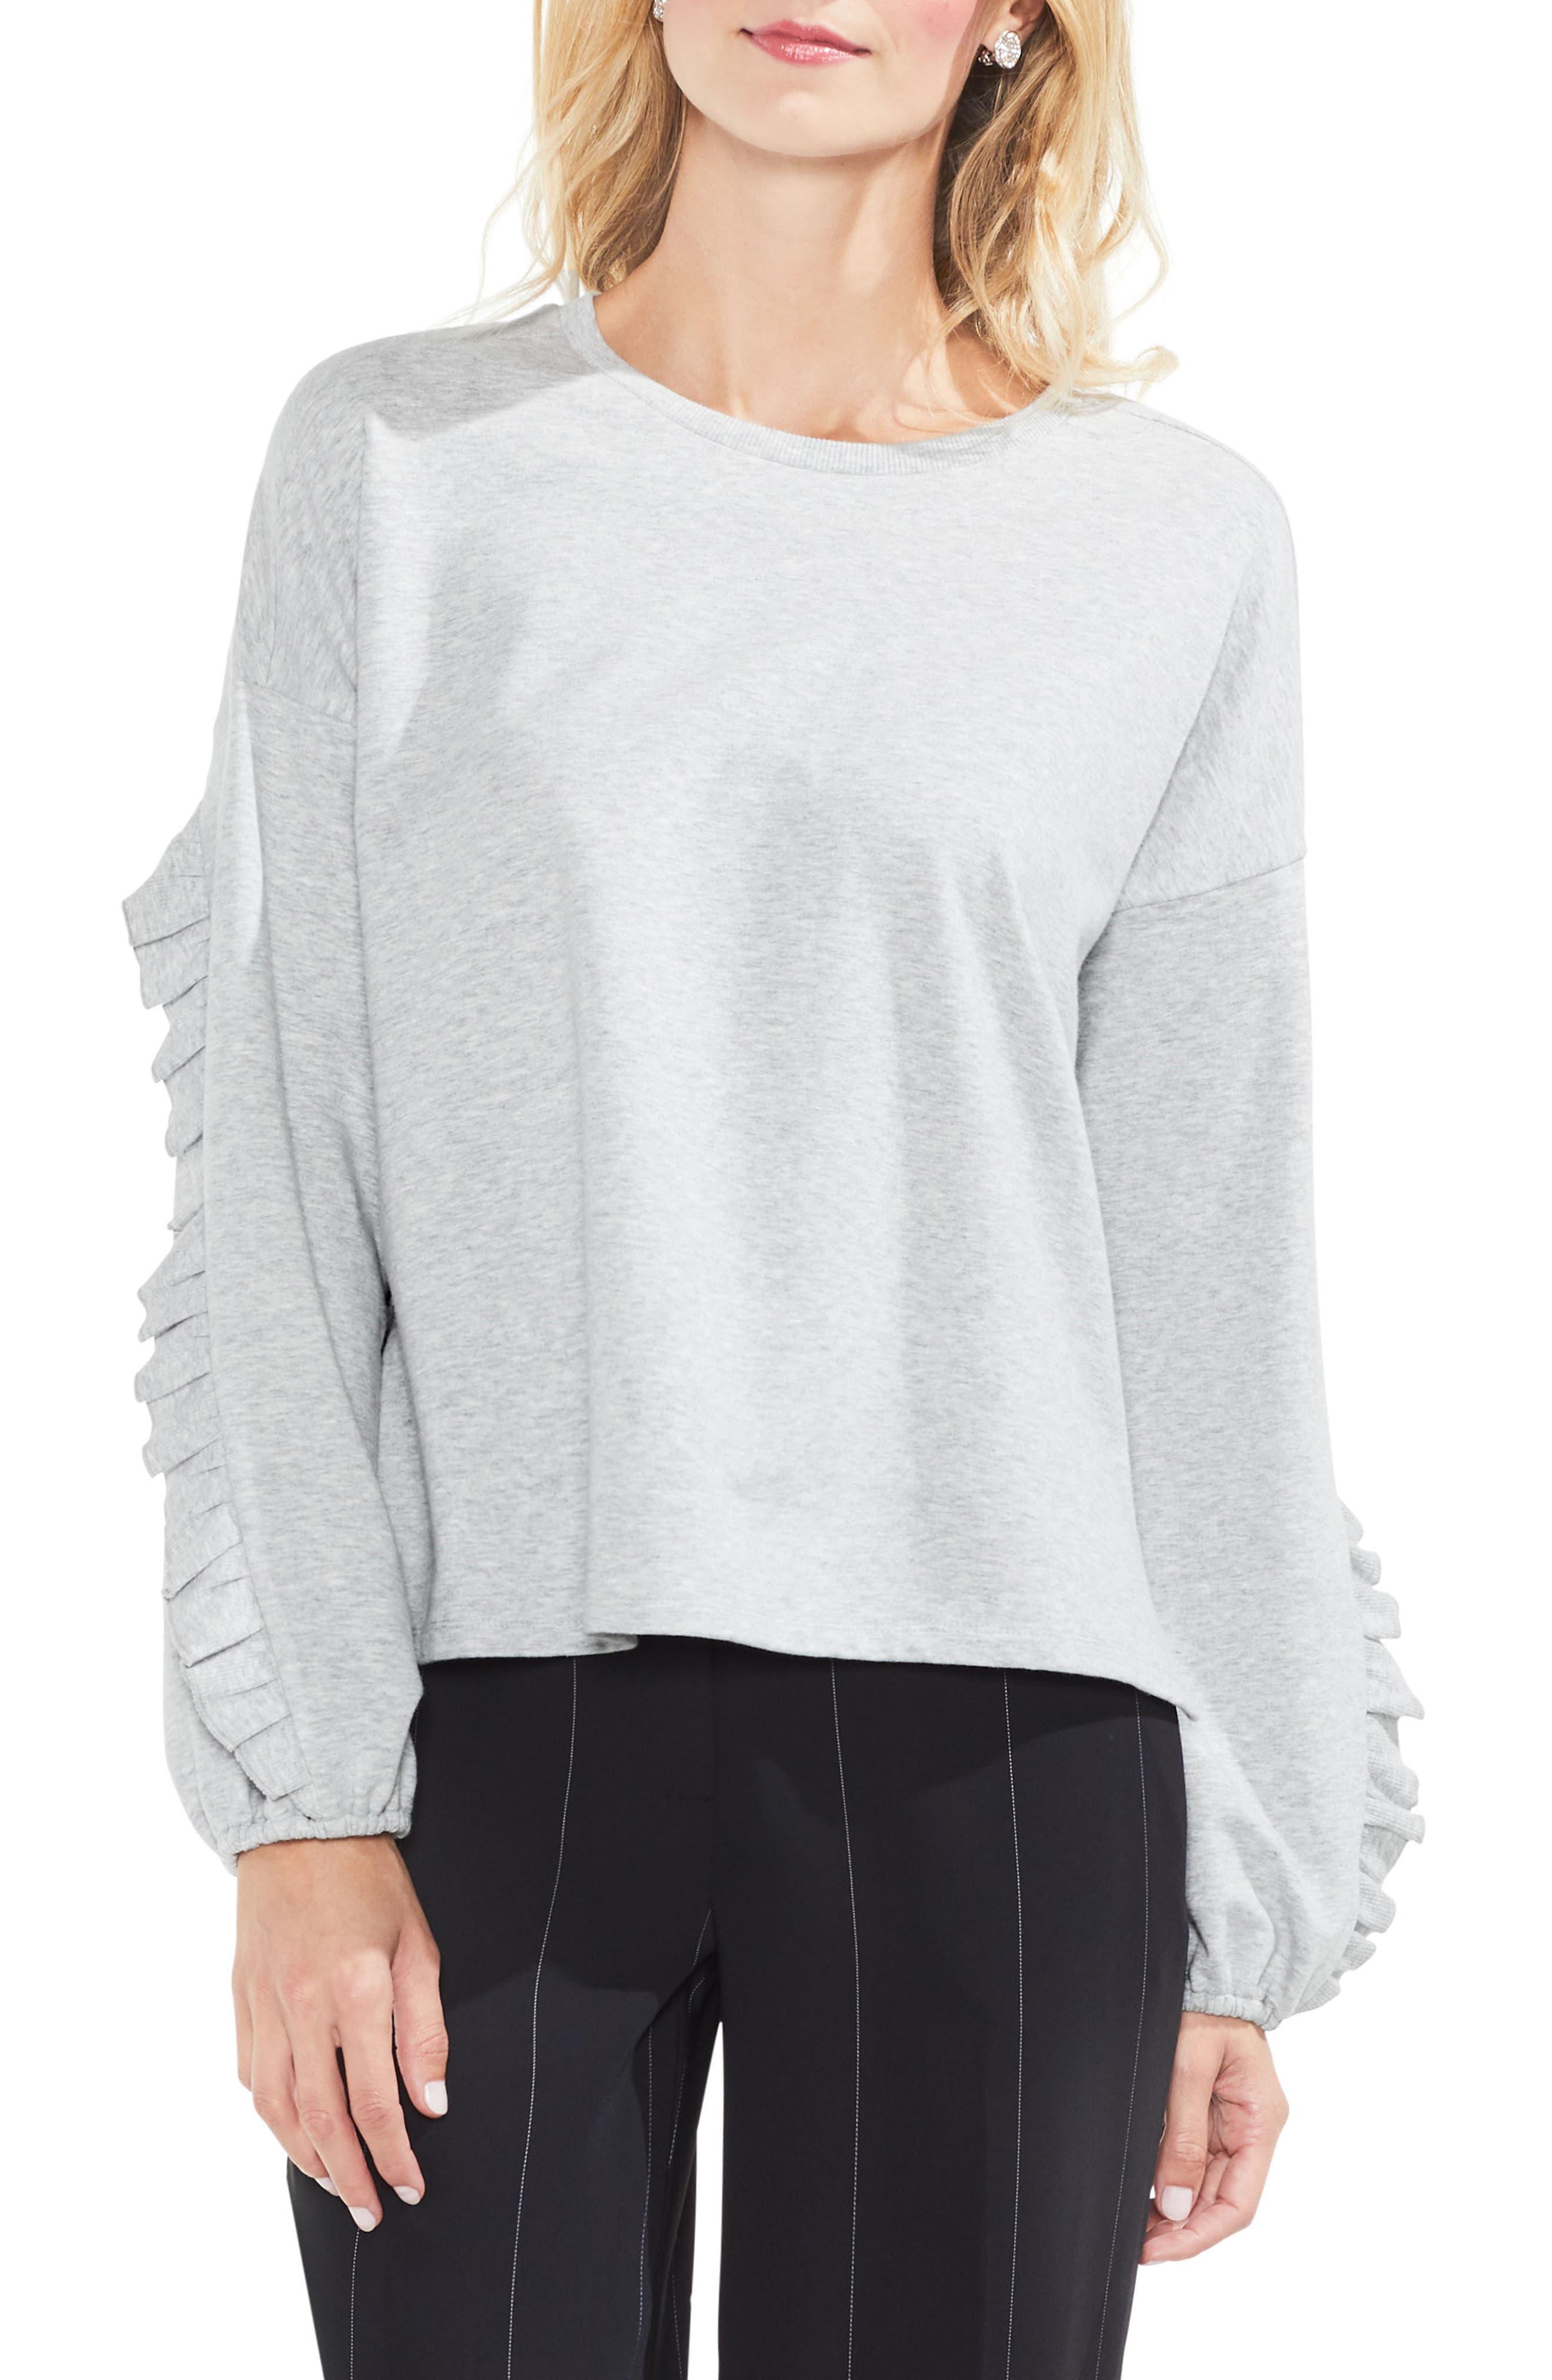 Ruffle Sleeve Sweatshirt,                             Main thumbnail 1, color,                             050